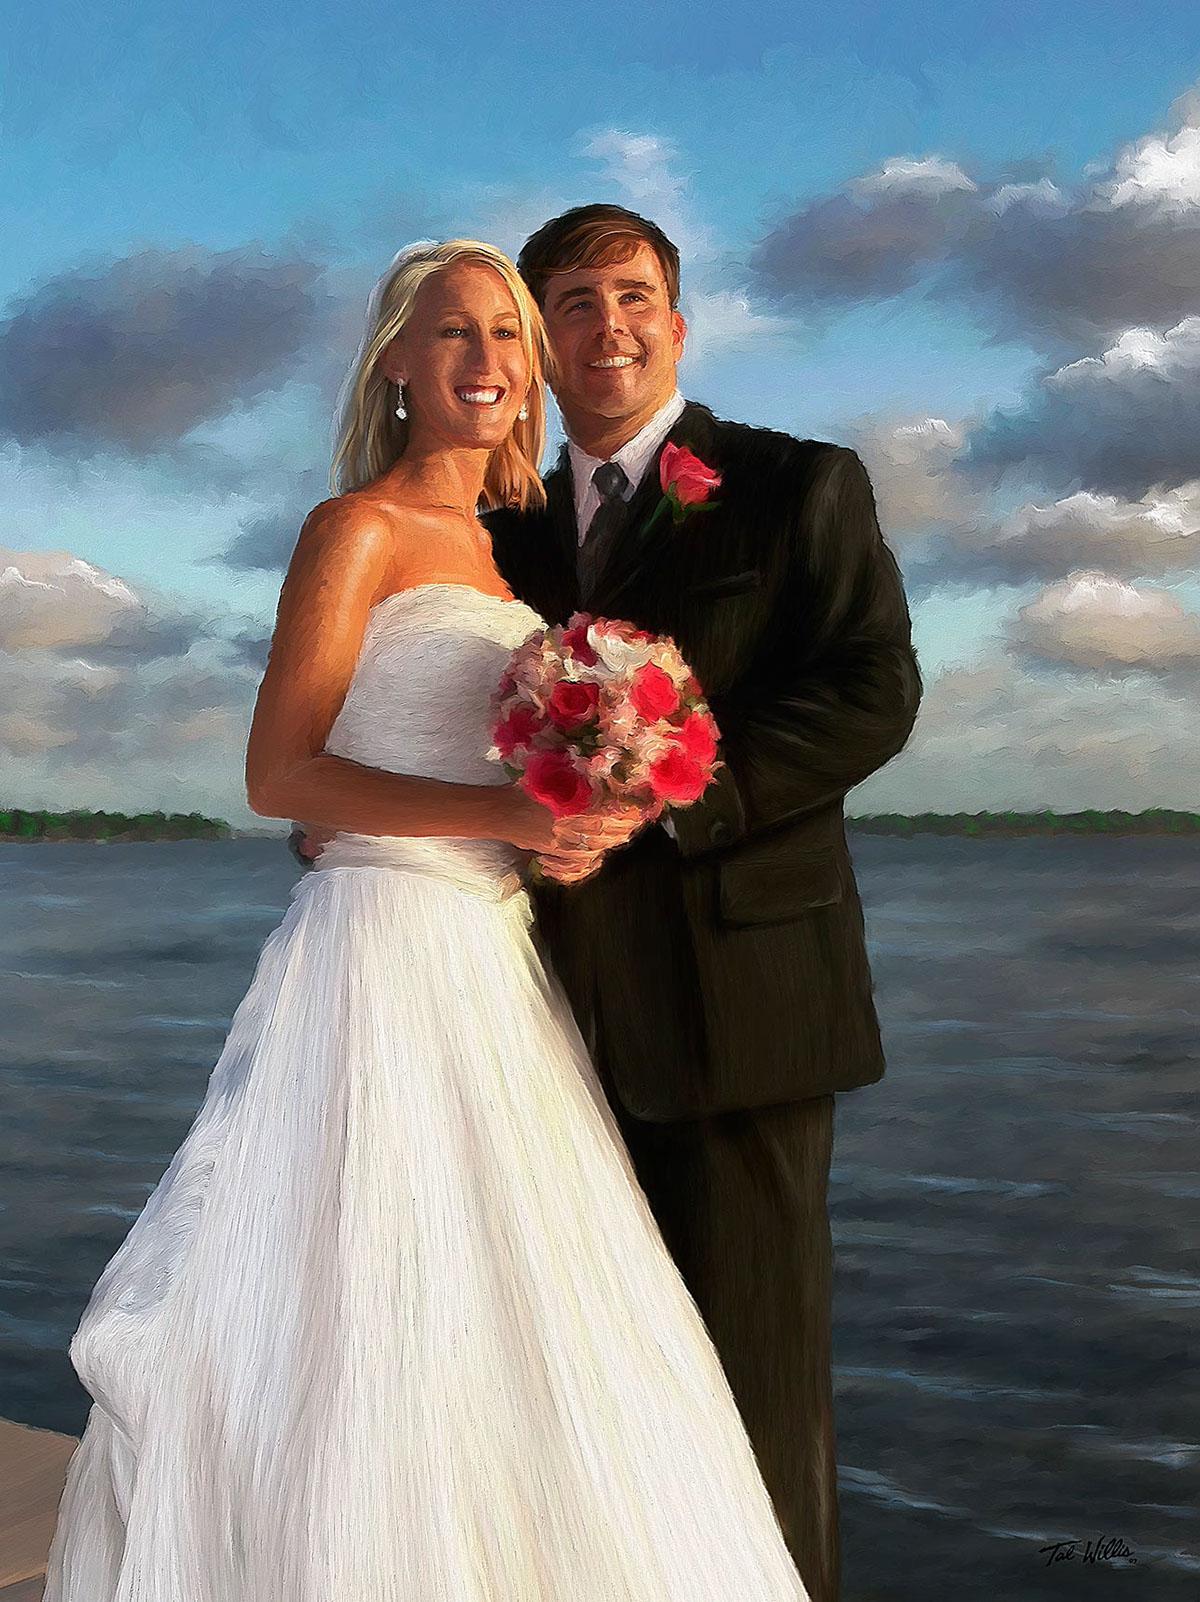 Custom Wedding Portraits wedding painting wedding photography florida jupiter island artists hobe sound artist wedding planners florida